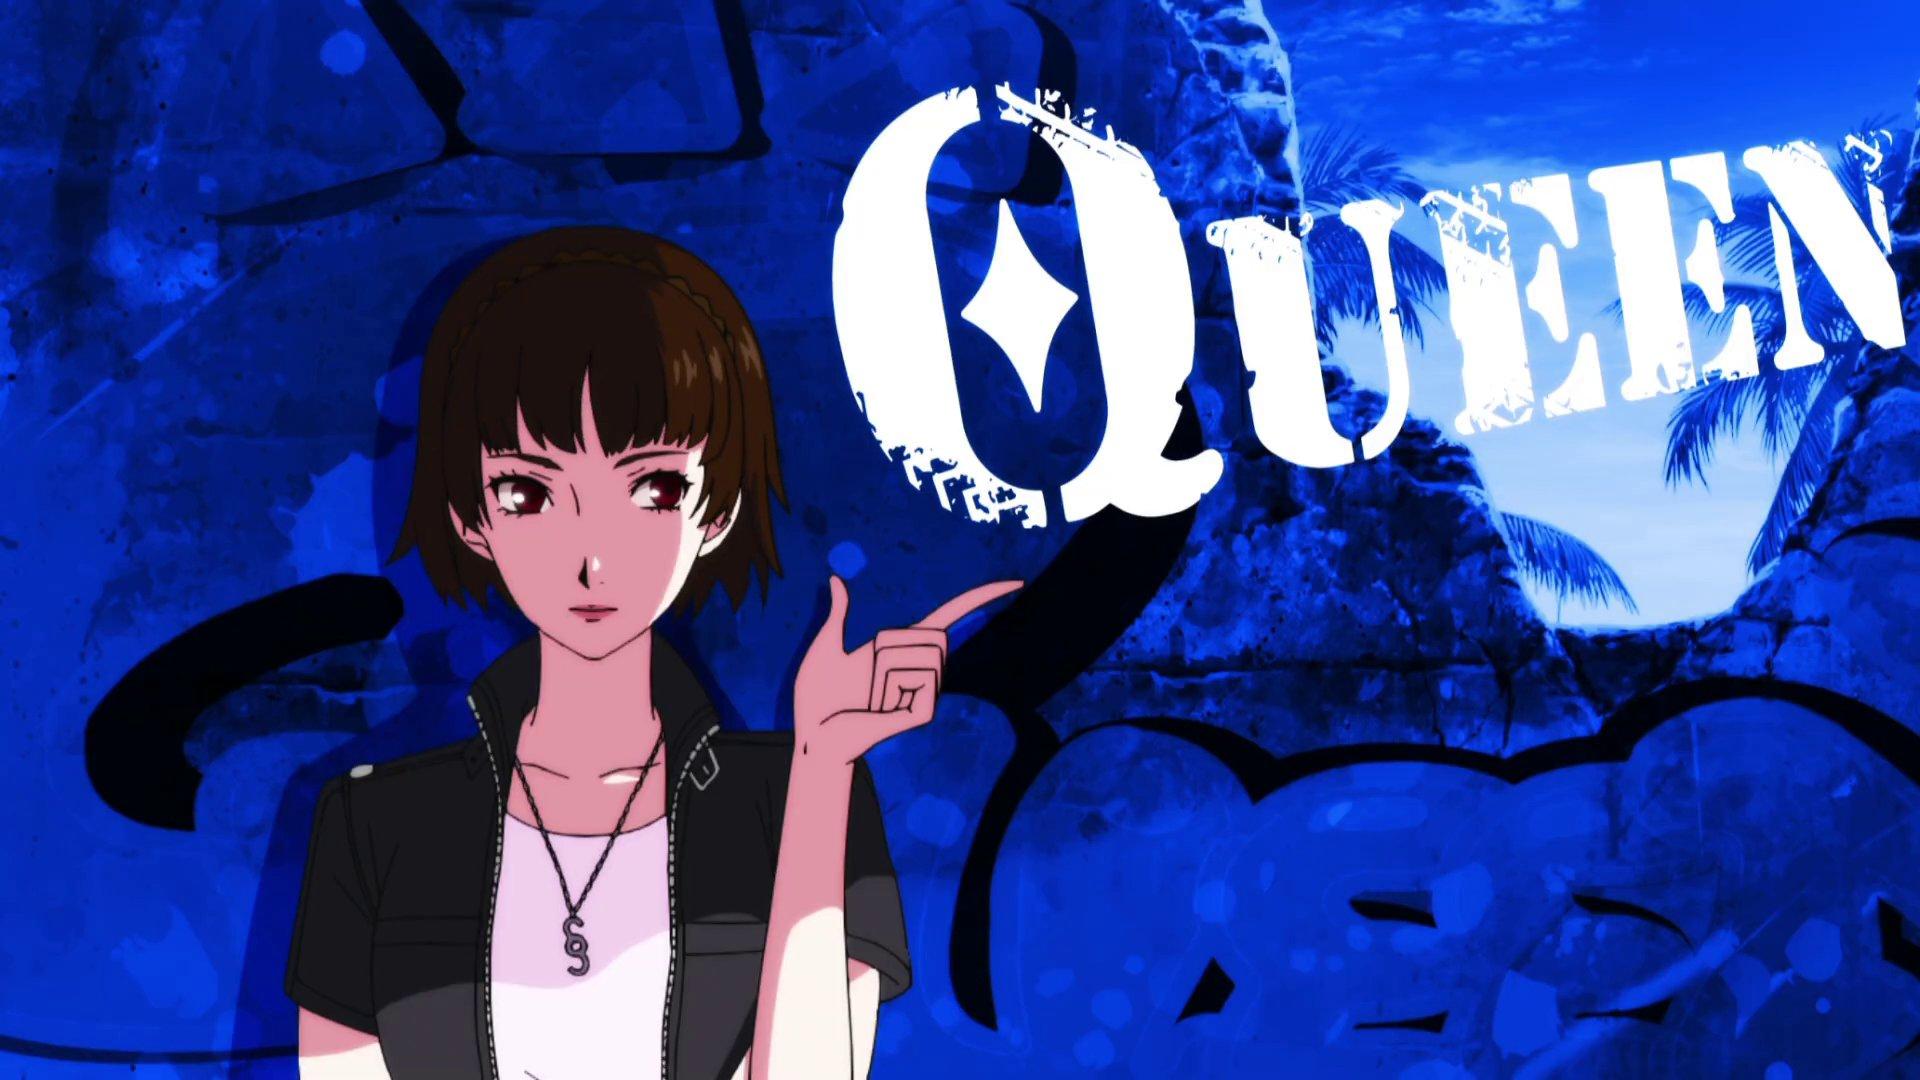 Robert On Twitter Persona 5 Scramble The Phantom Strikers Op Makoto Niijima Queen Haru Okumura Noir And Futaba Sakura Oracle P5s Persona5 Https T Co Tpeahfvxkj